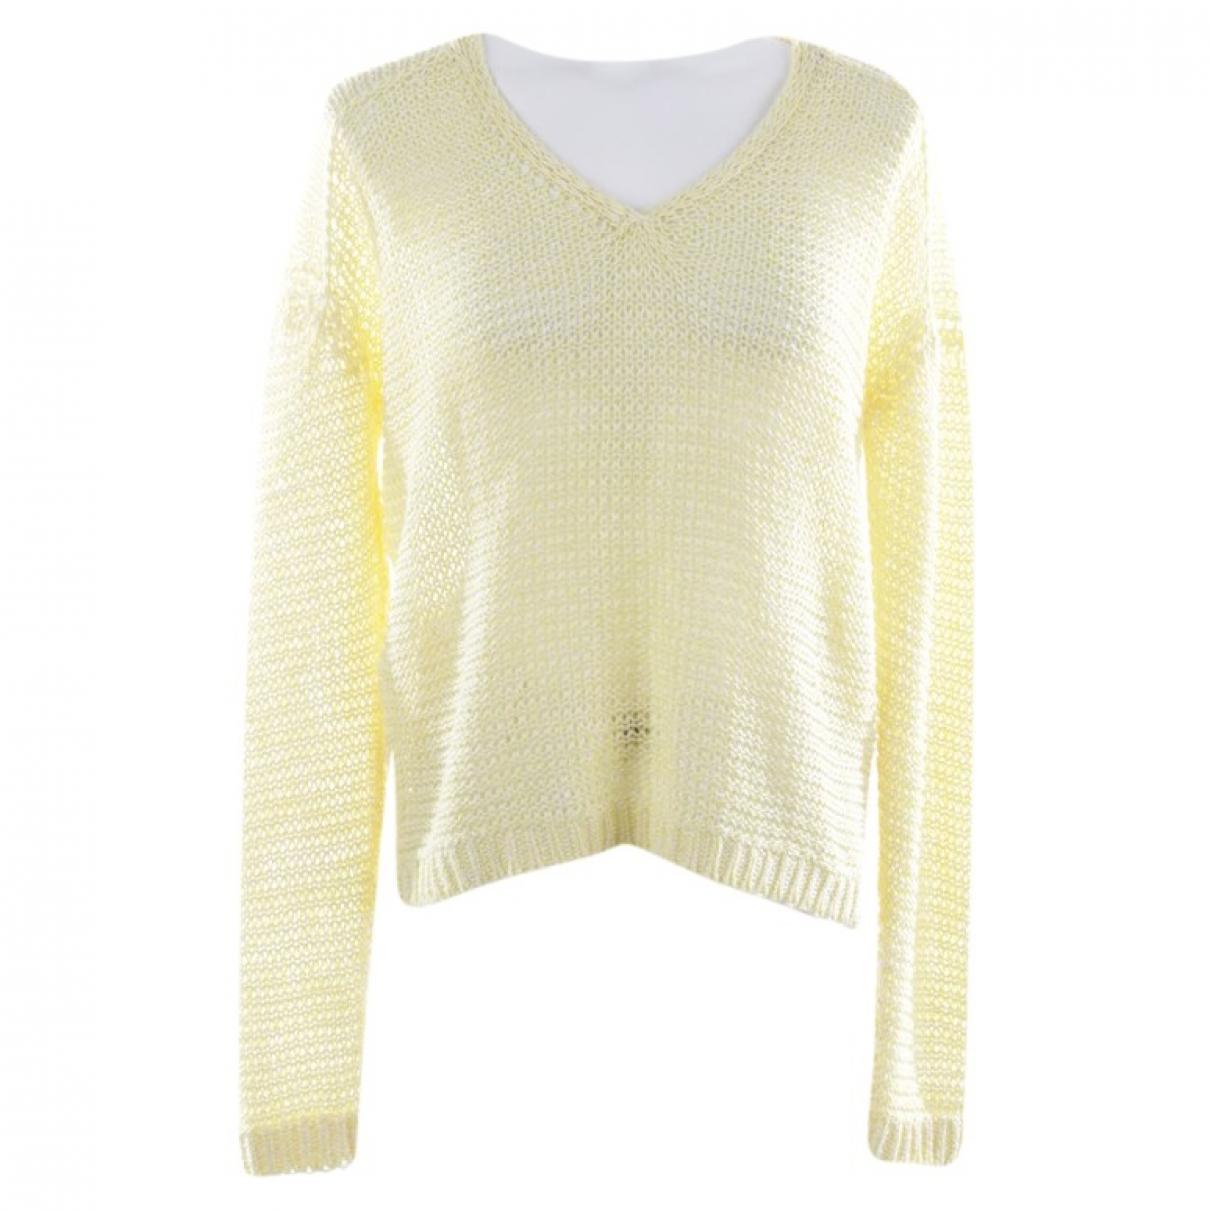 Iris Von Arnim - Pull   pour femme en coton - jaune